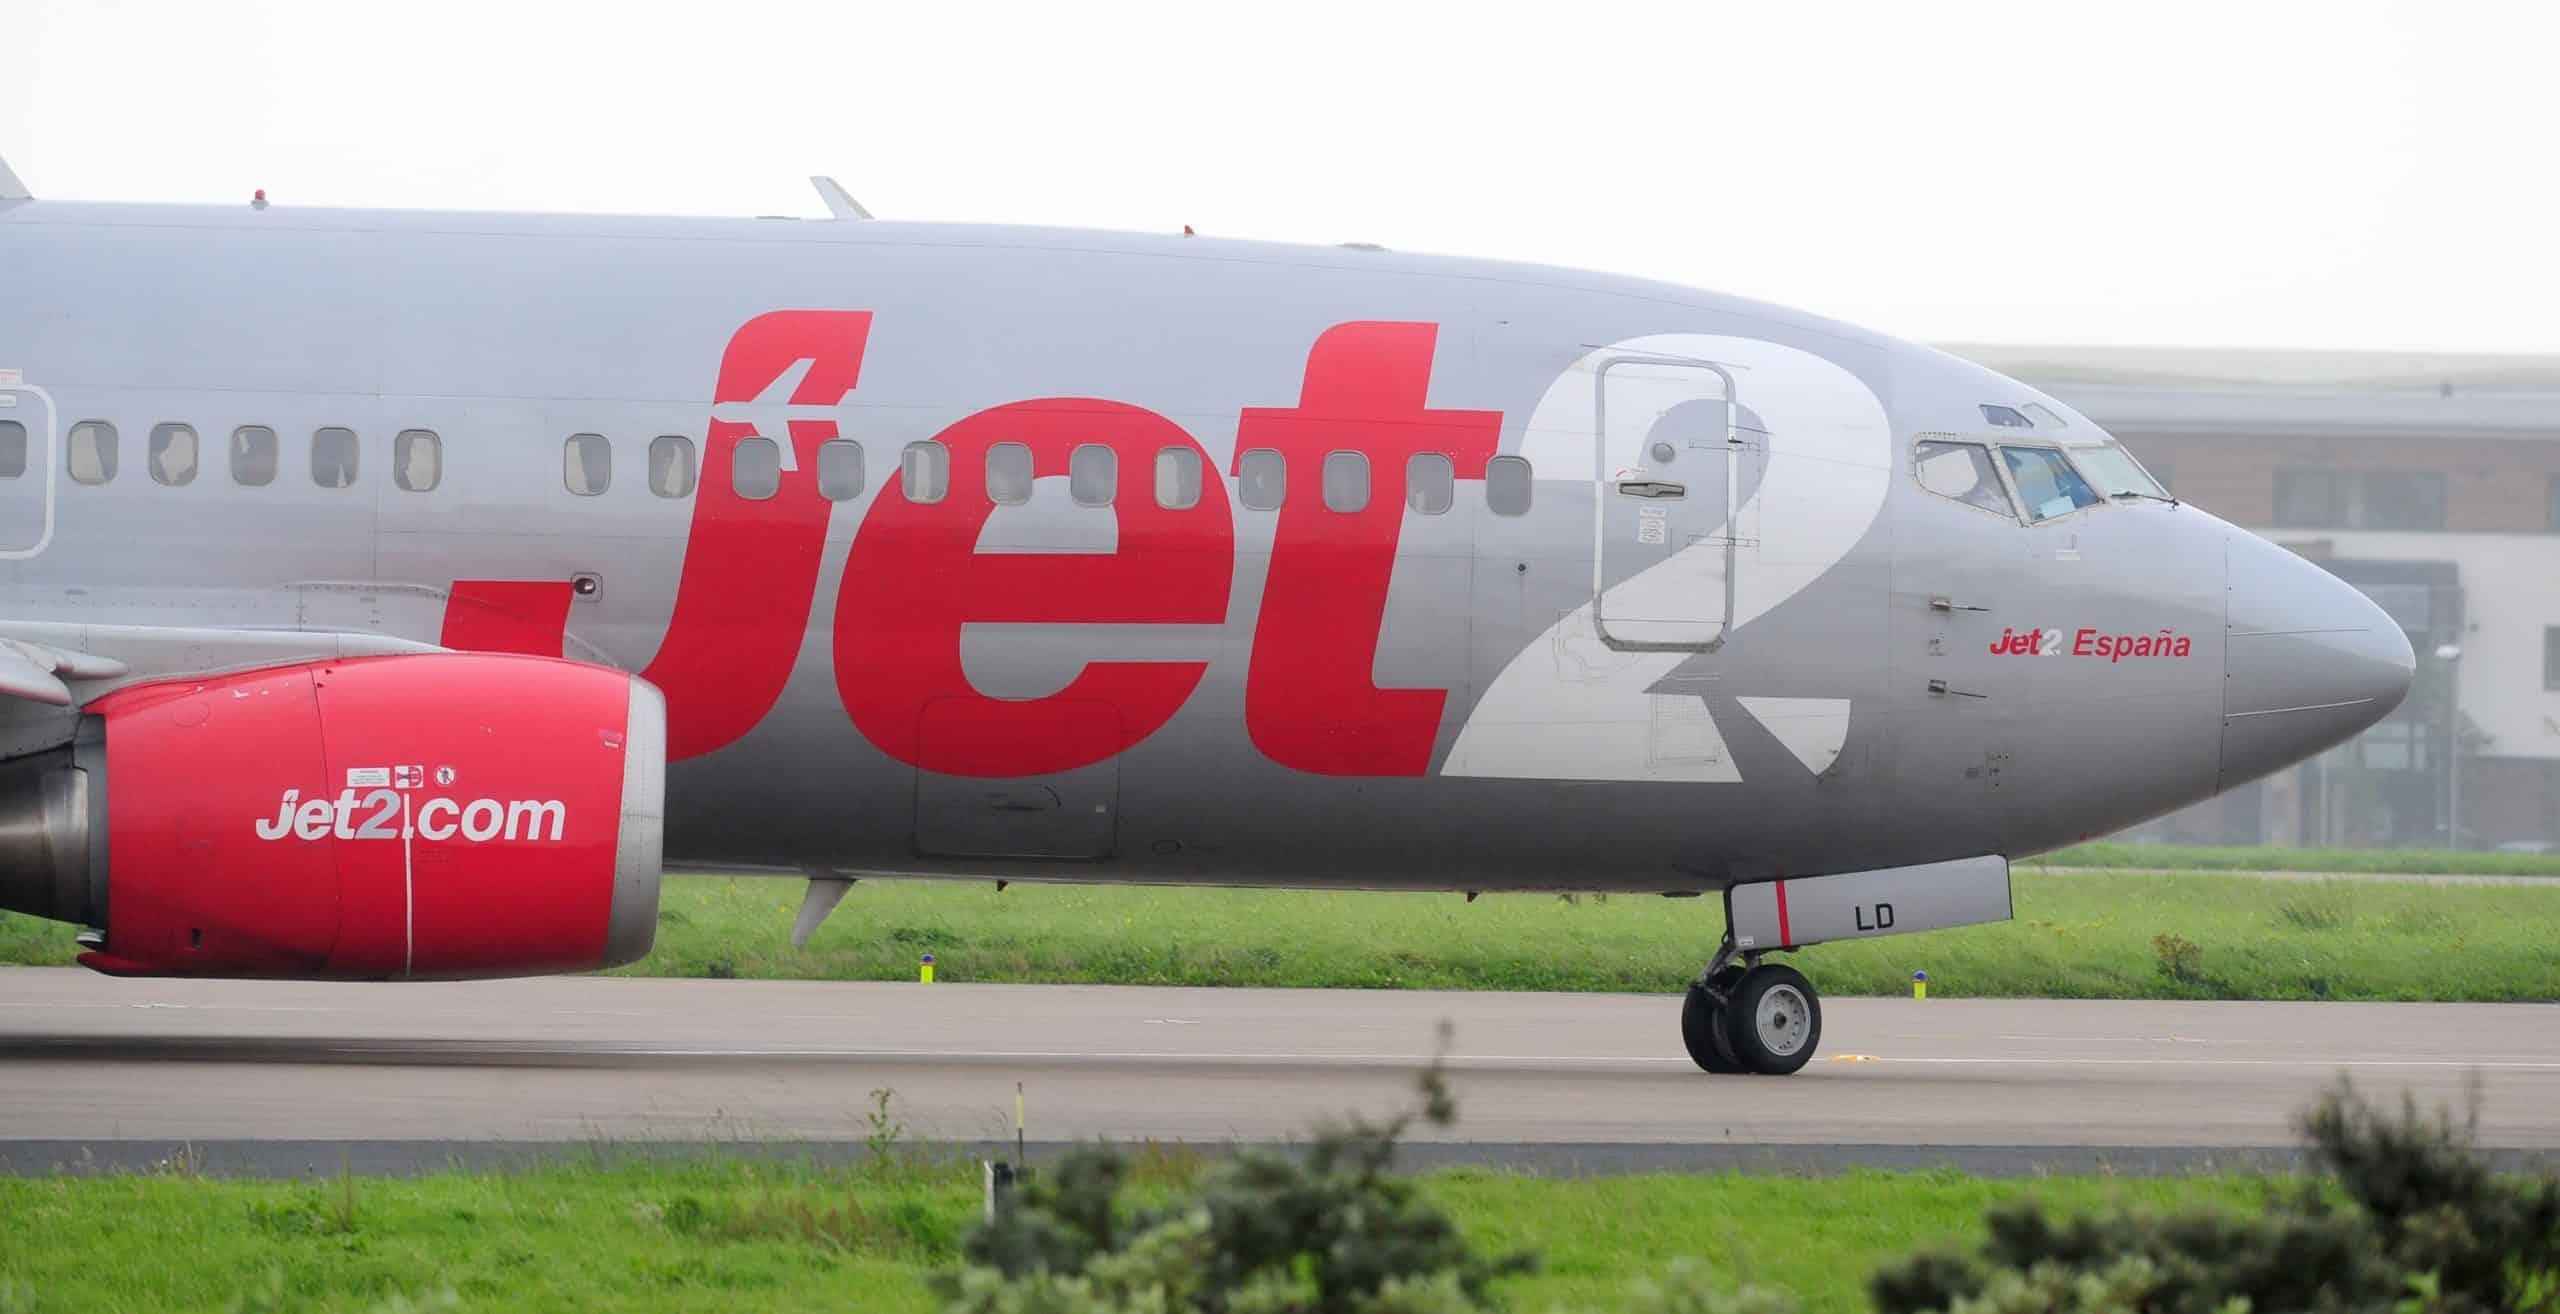 Jet2 Planes Turn Back From Spain Mid-Flight